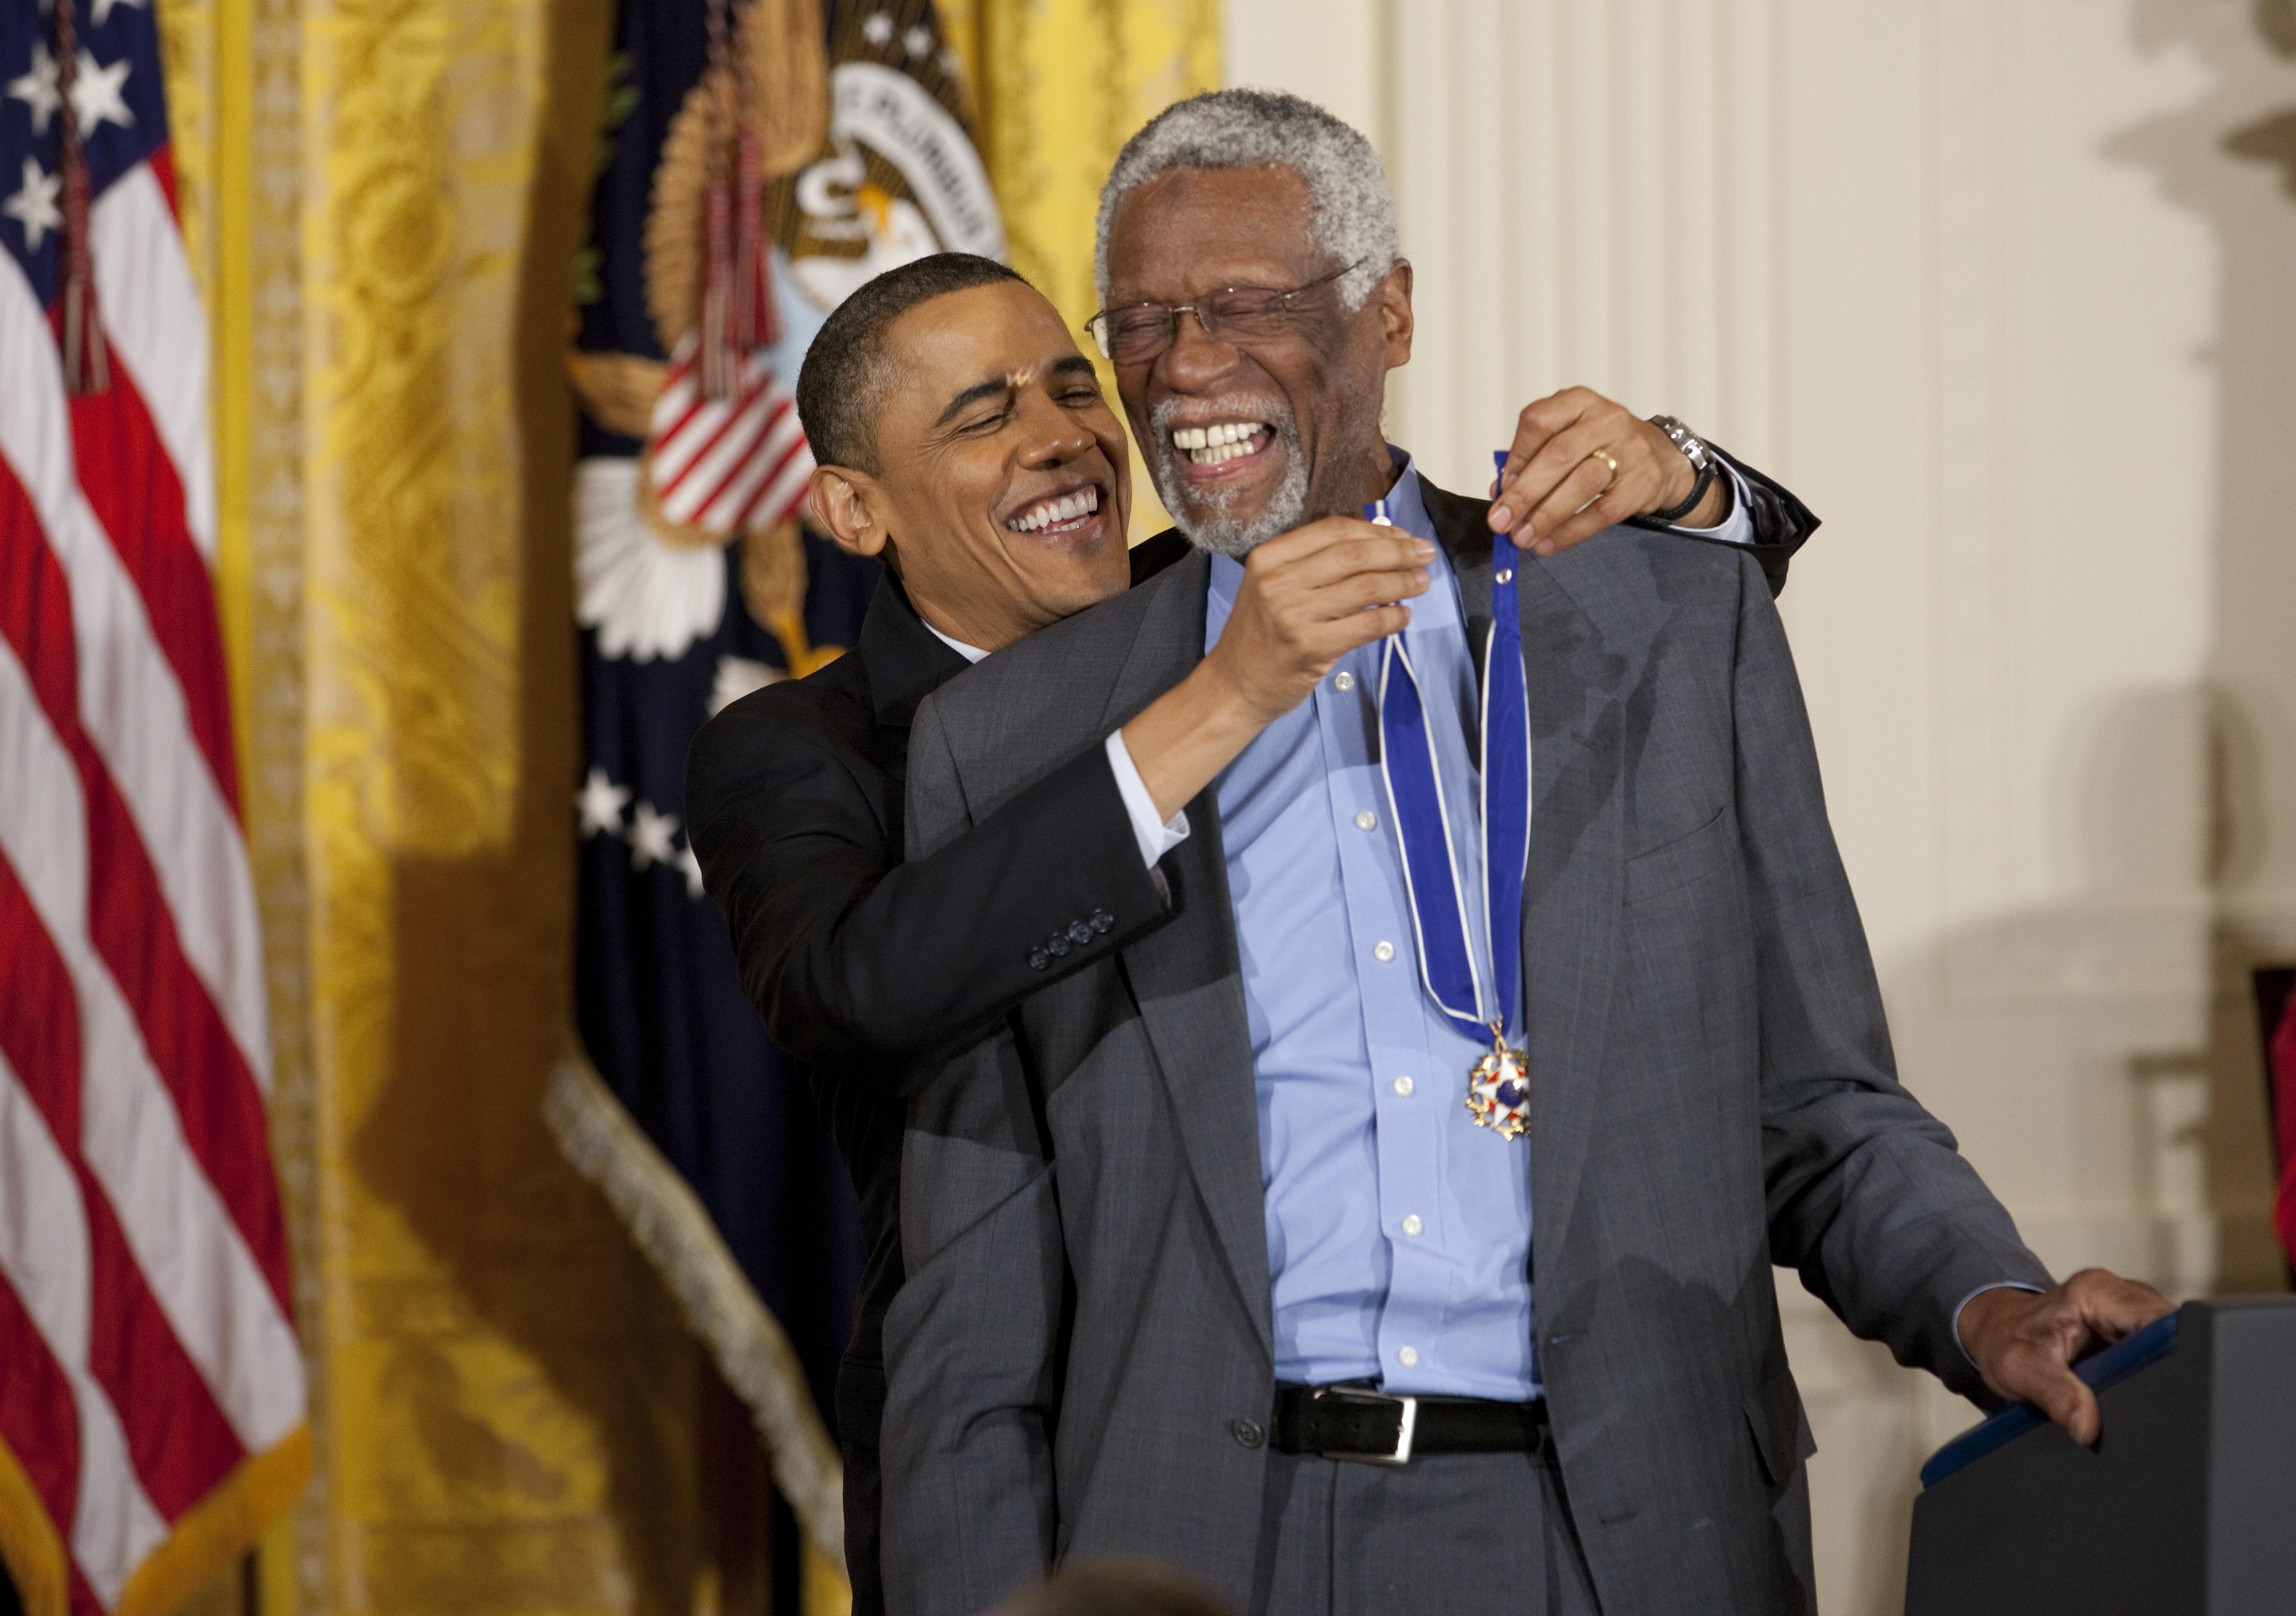 USA - Politics - President Obama Awards Medal of Freedom